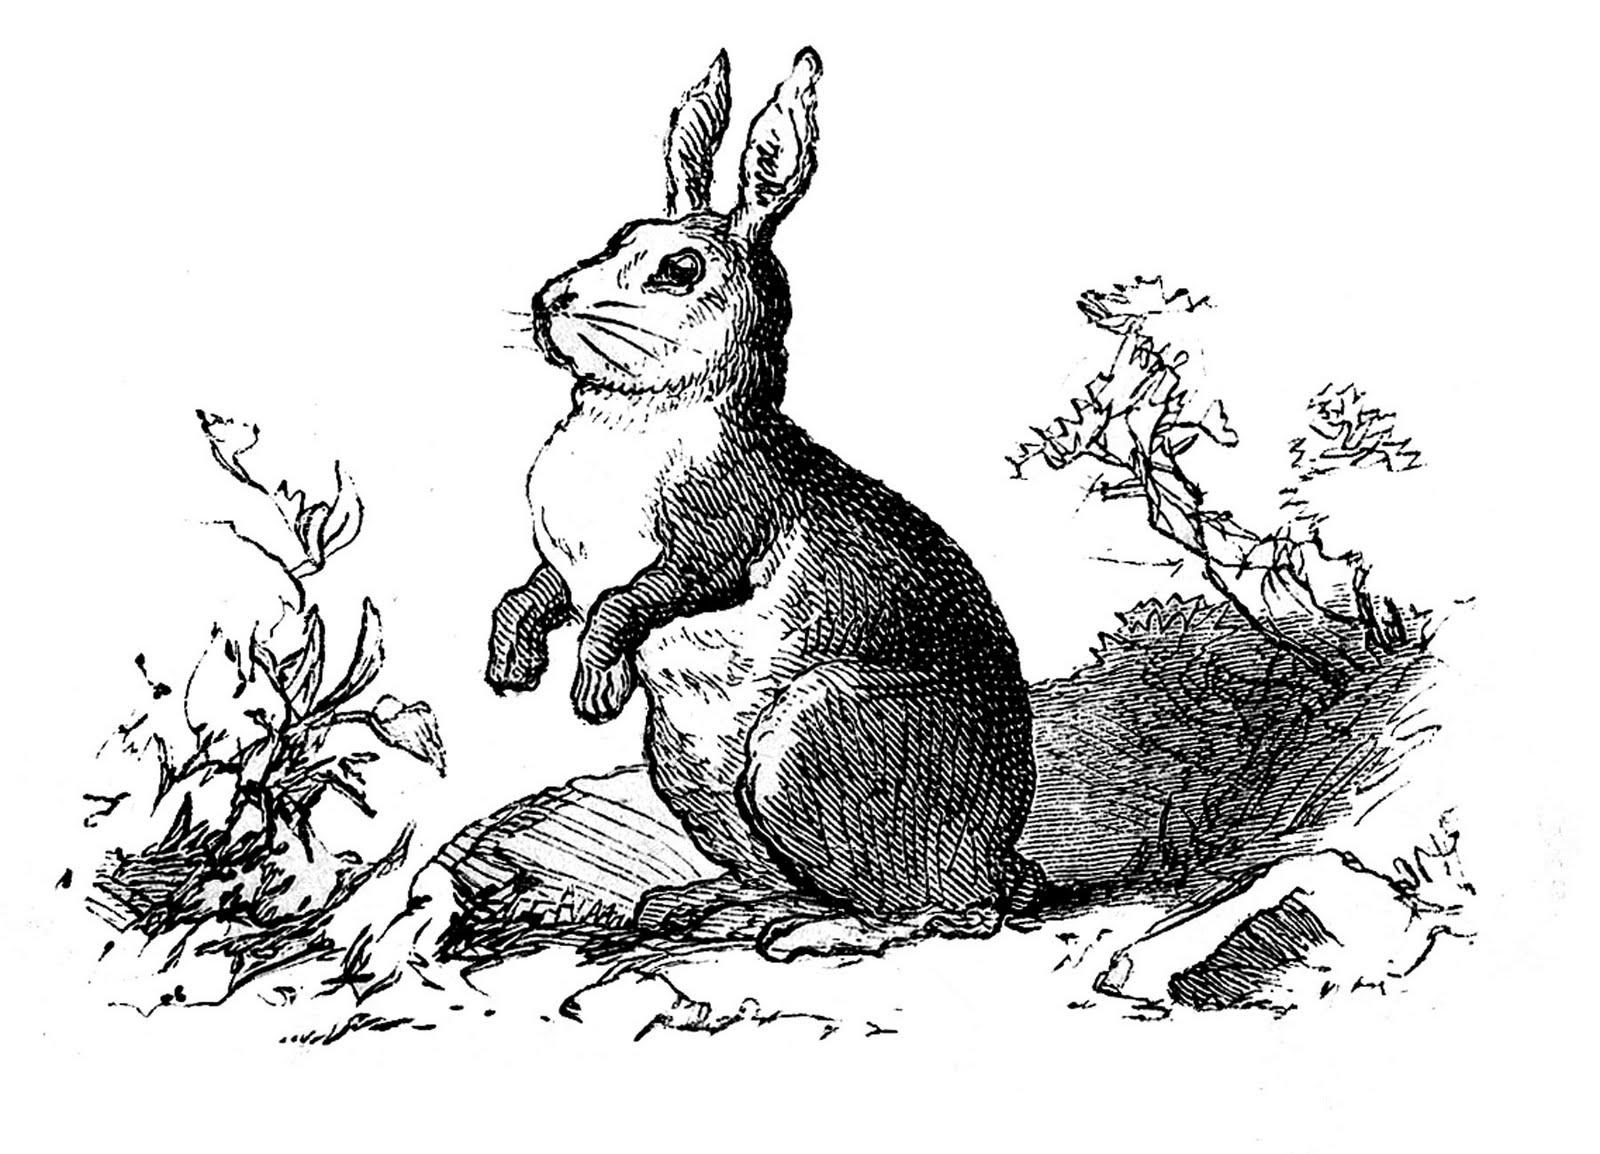 Vintage Clip Art - Precious Bunny Engraving - The Graphics ...